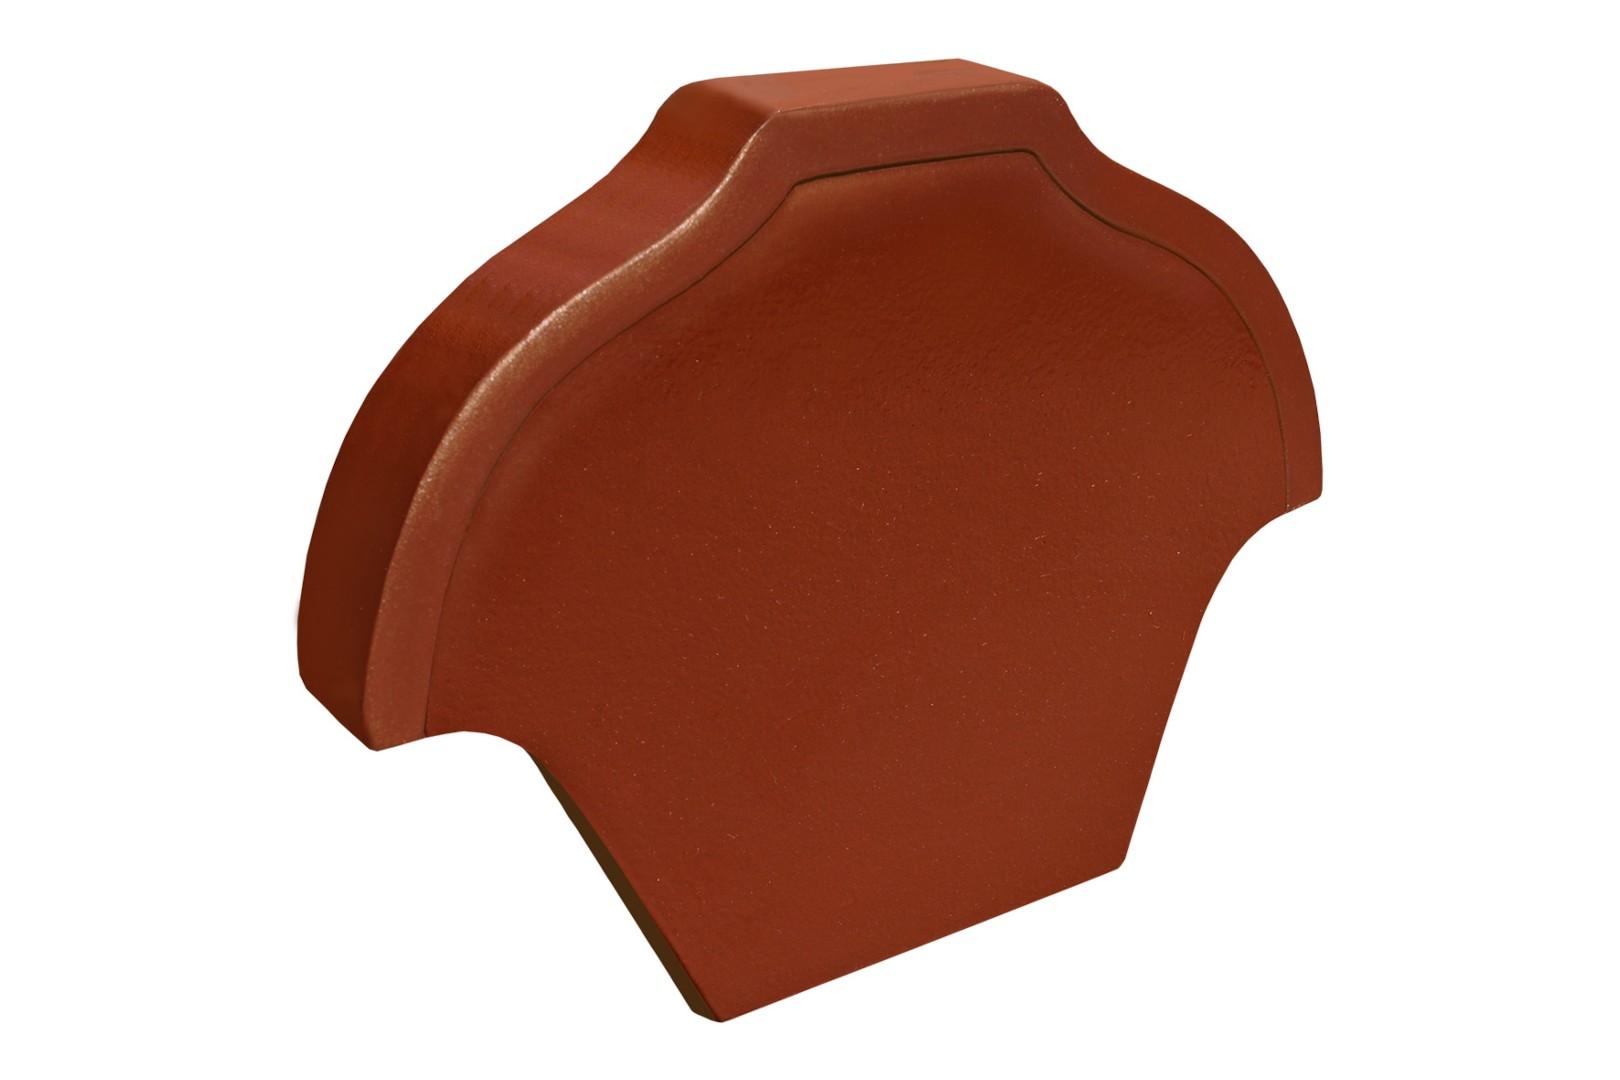 Završna pločica žlebnjaka bordo